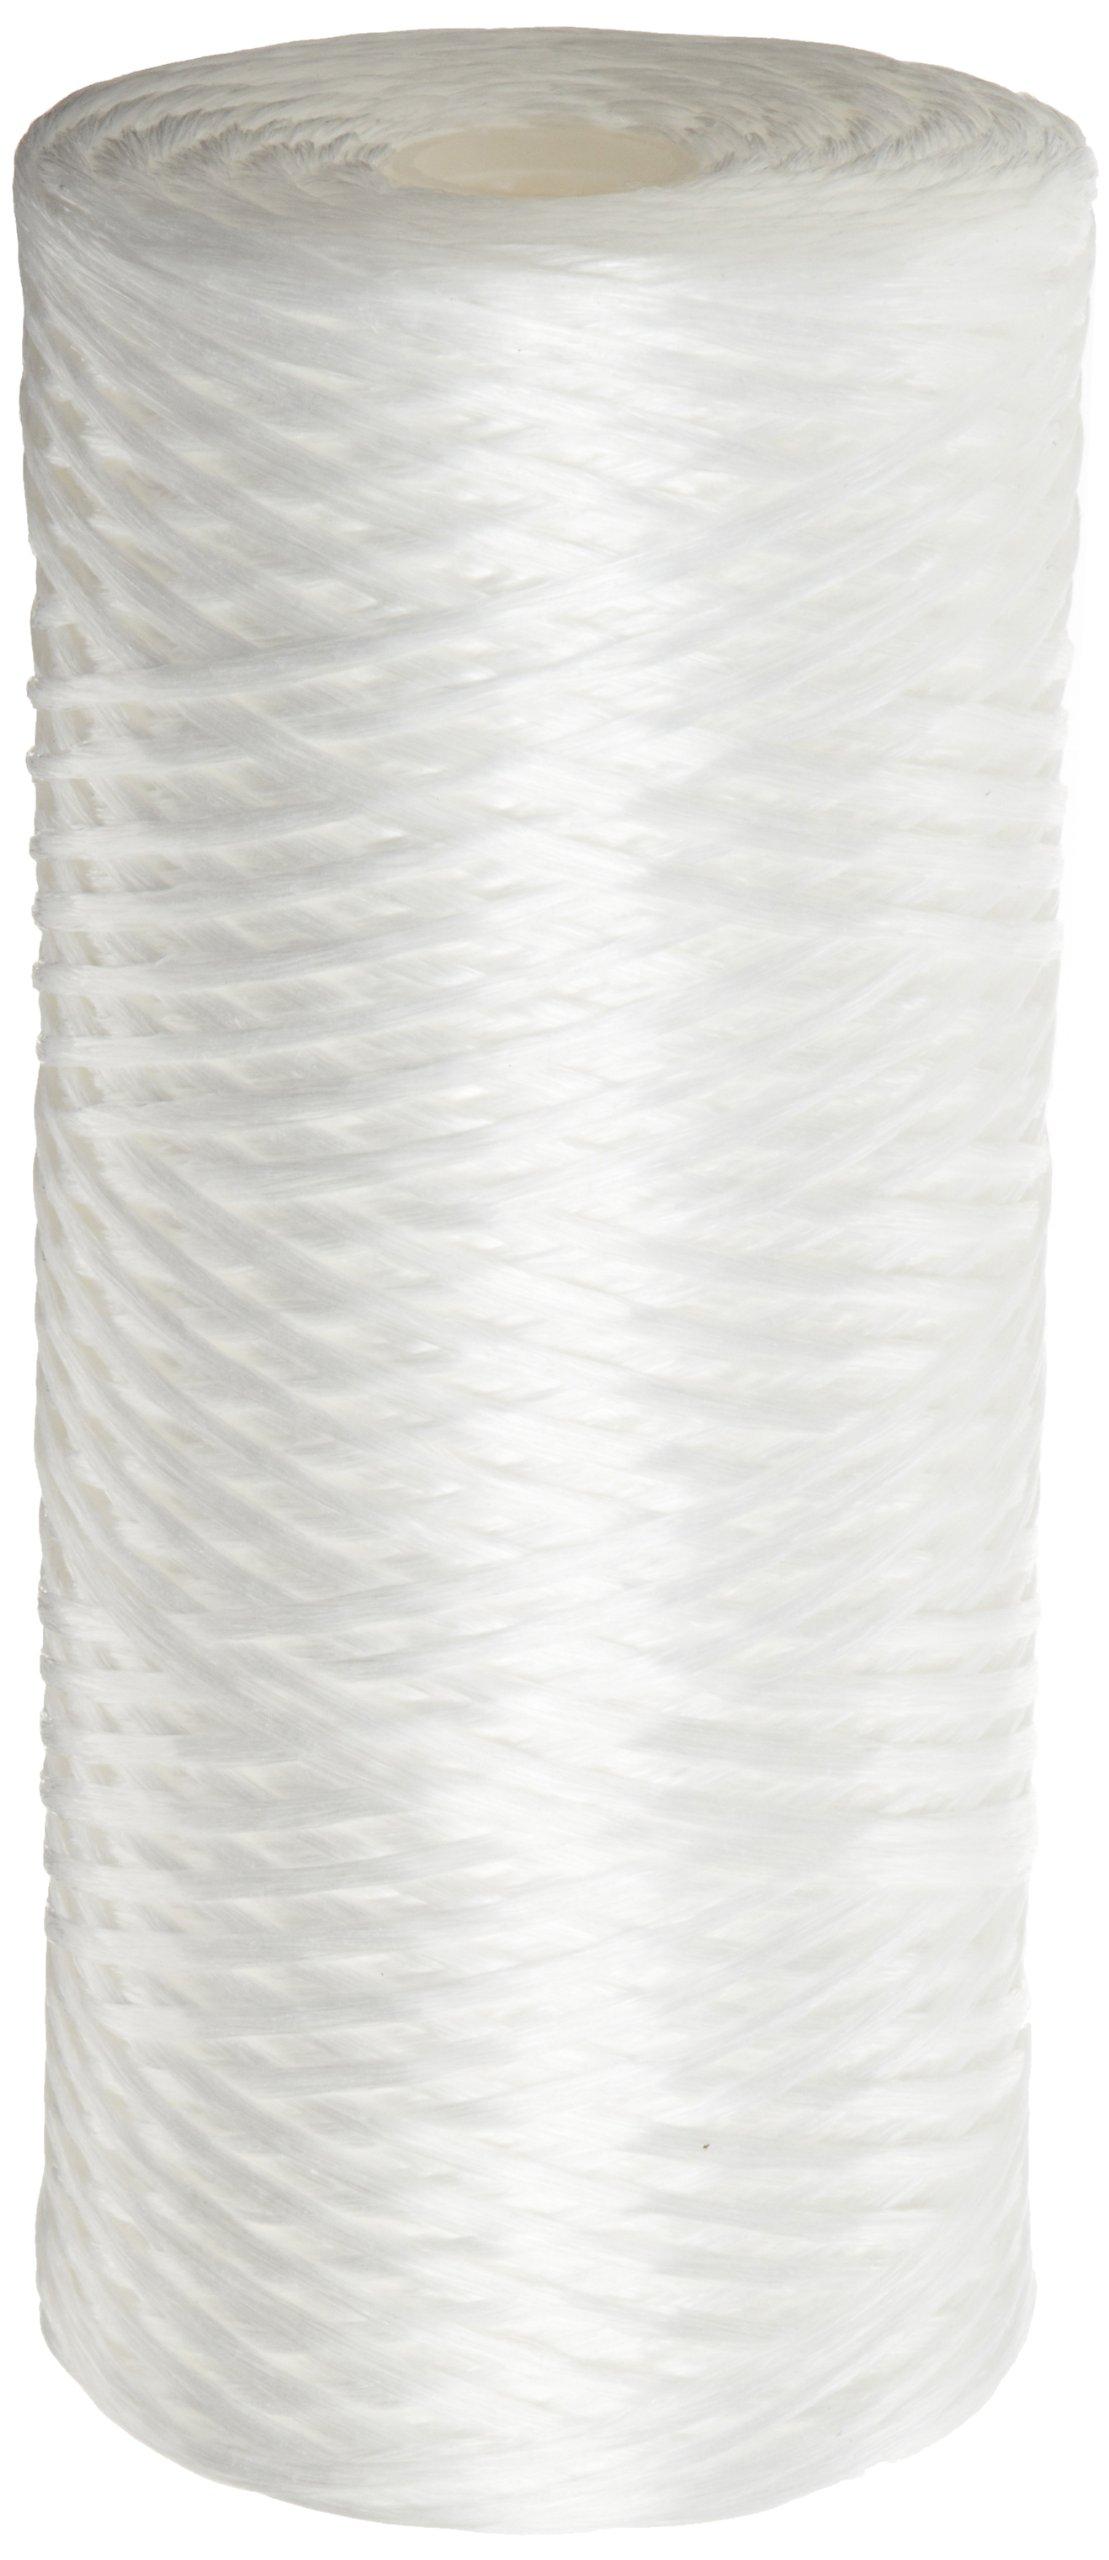 Pentek WPX25BB97P String-Wound Polypropylene Filter Cartridge, 10'' x 4.5'', 25 Microns by Pentek